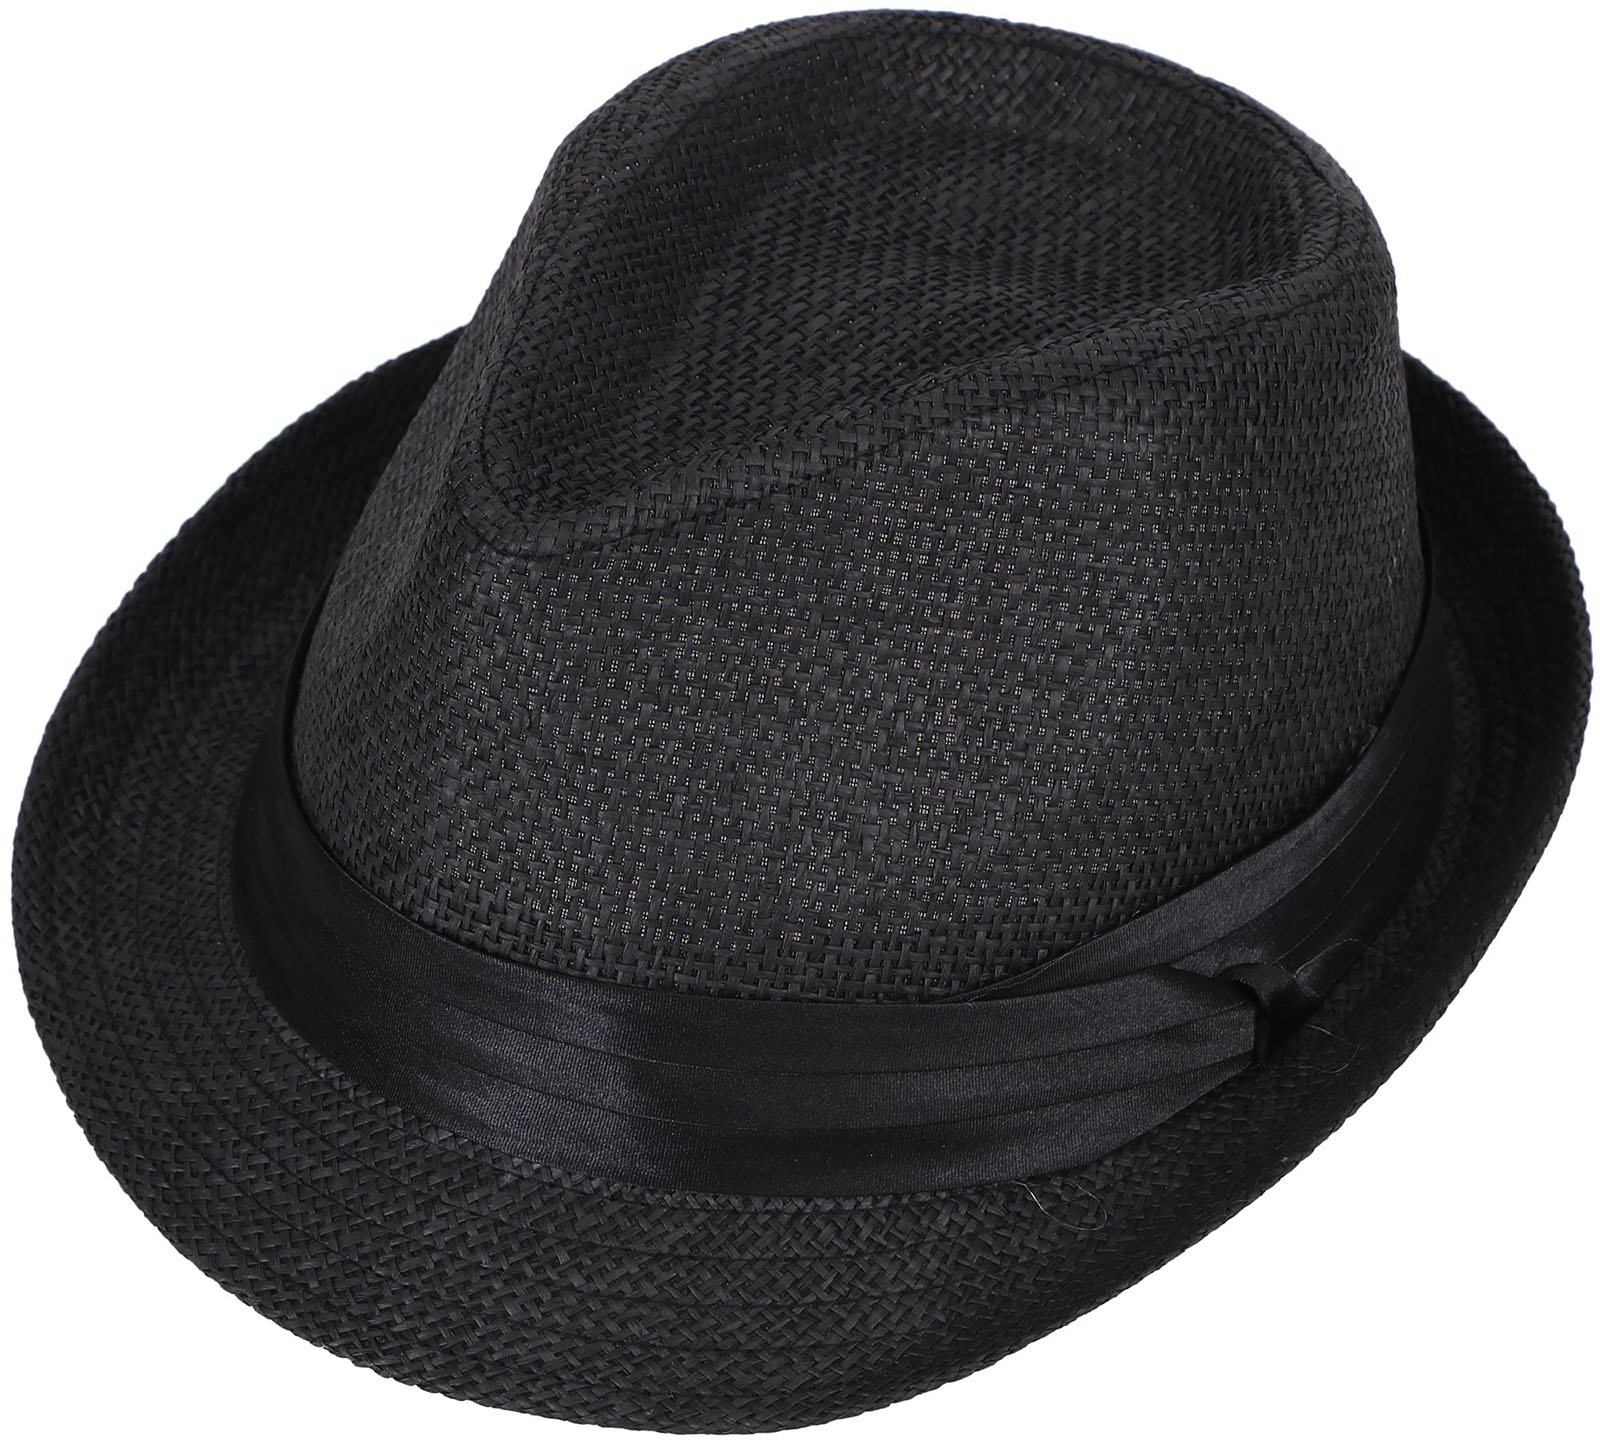 Livingston Unisex Summer Straw Structured Fedora Hat w/Cloth Band, Black, L/XL